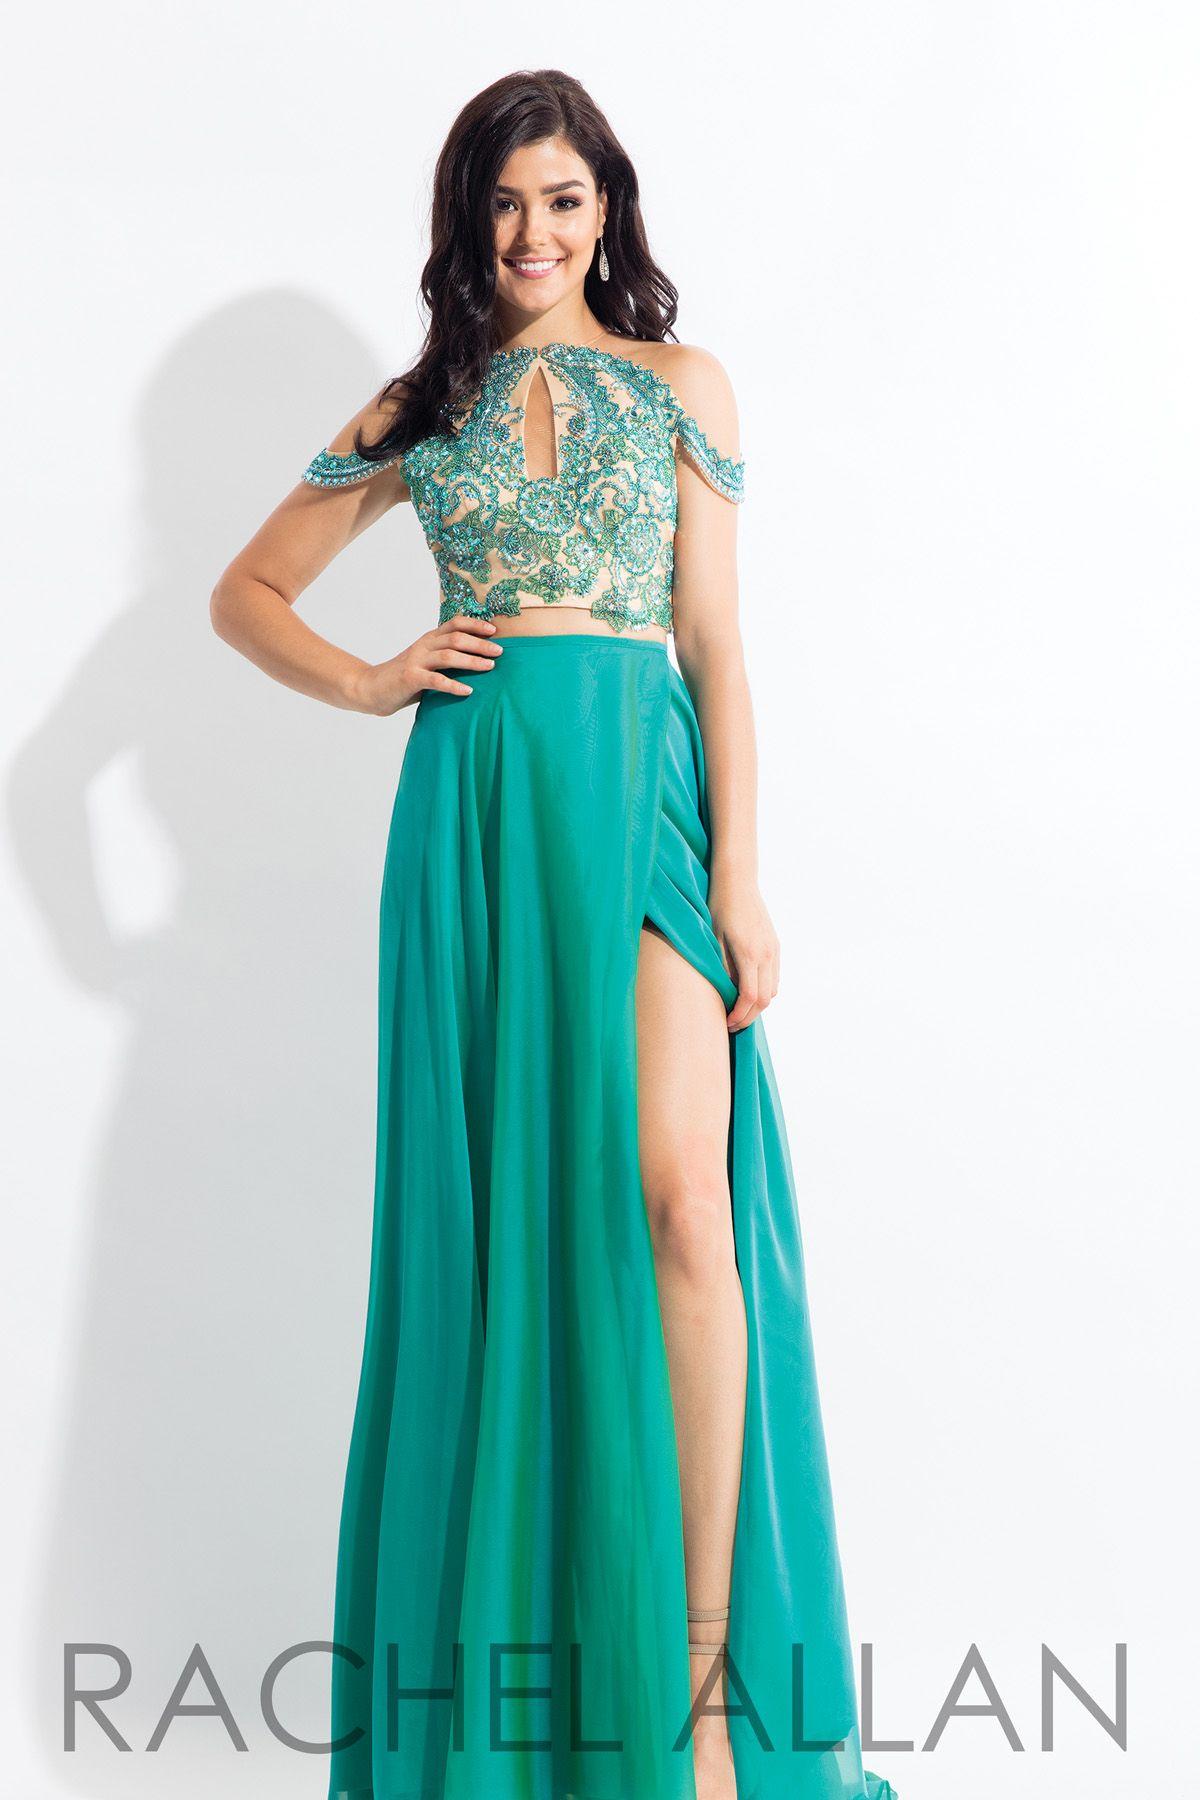 Rachel Allan 6109 - International Prom Association Dresses ...